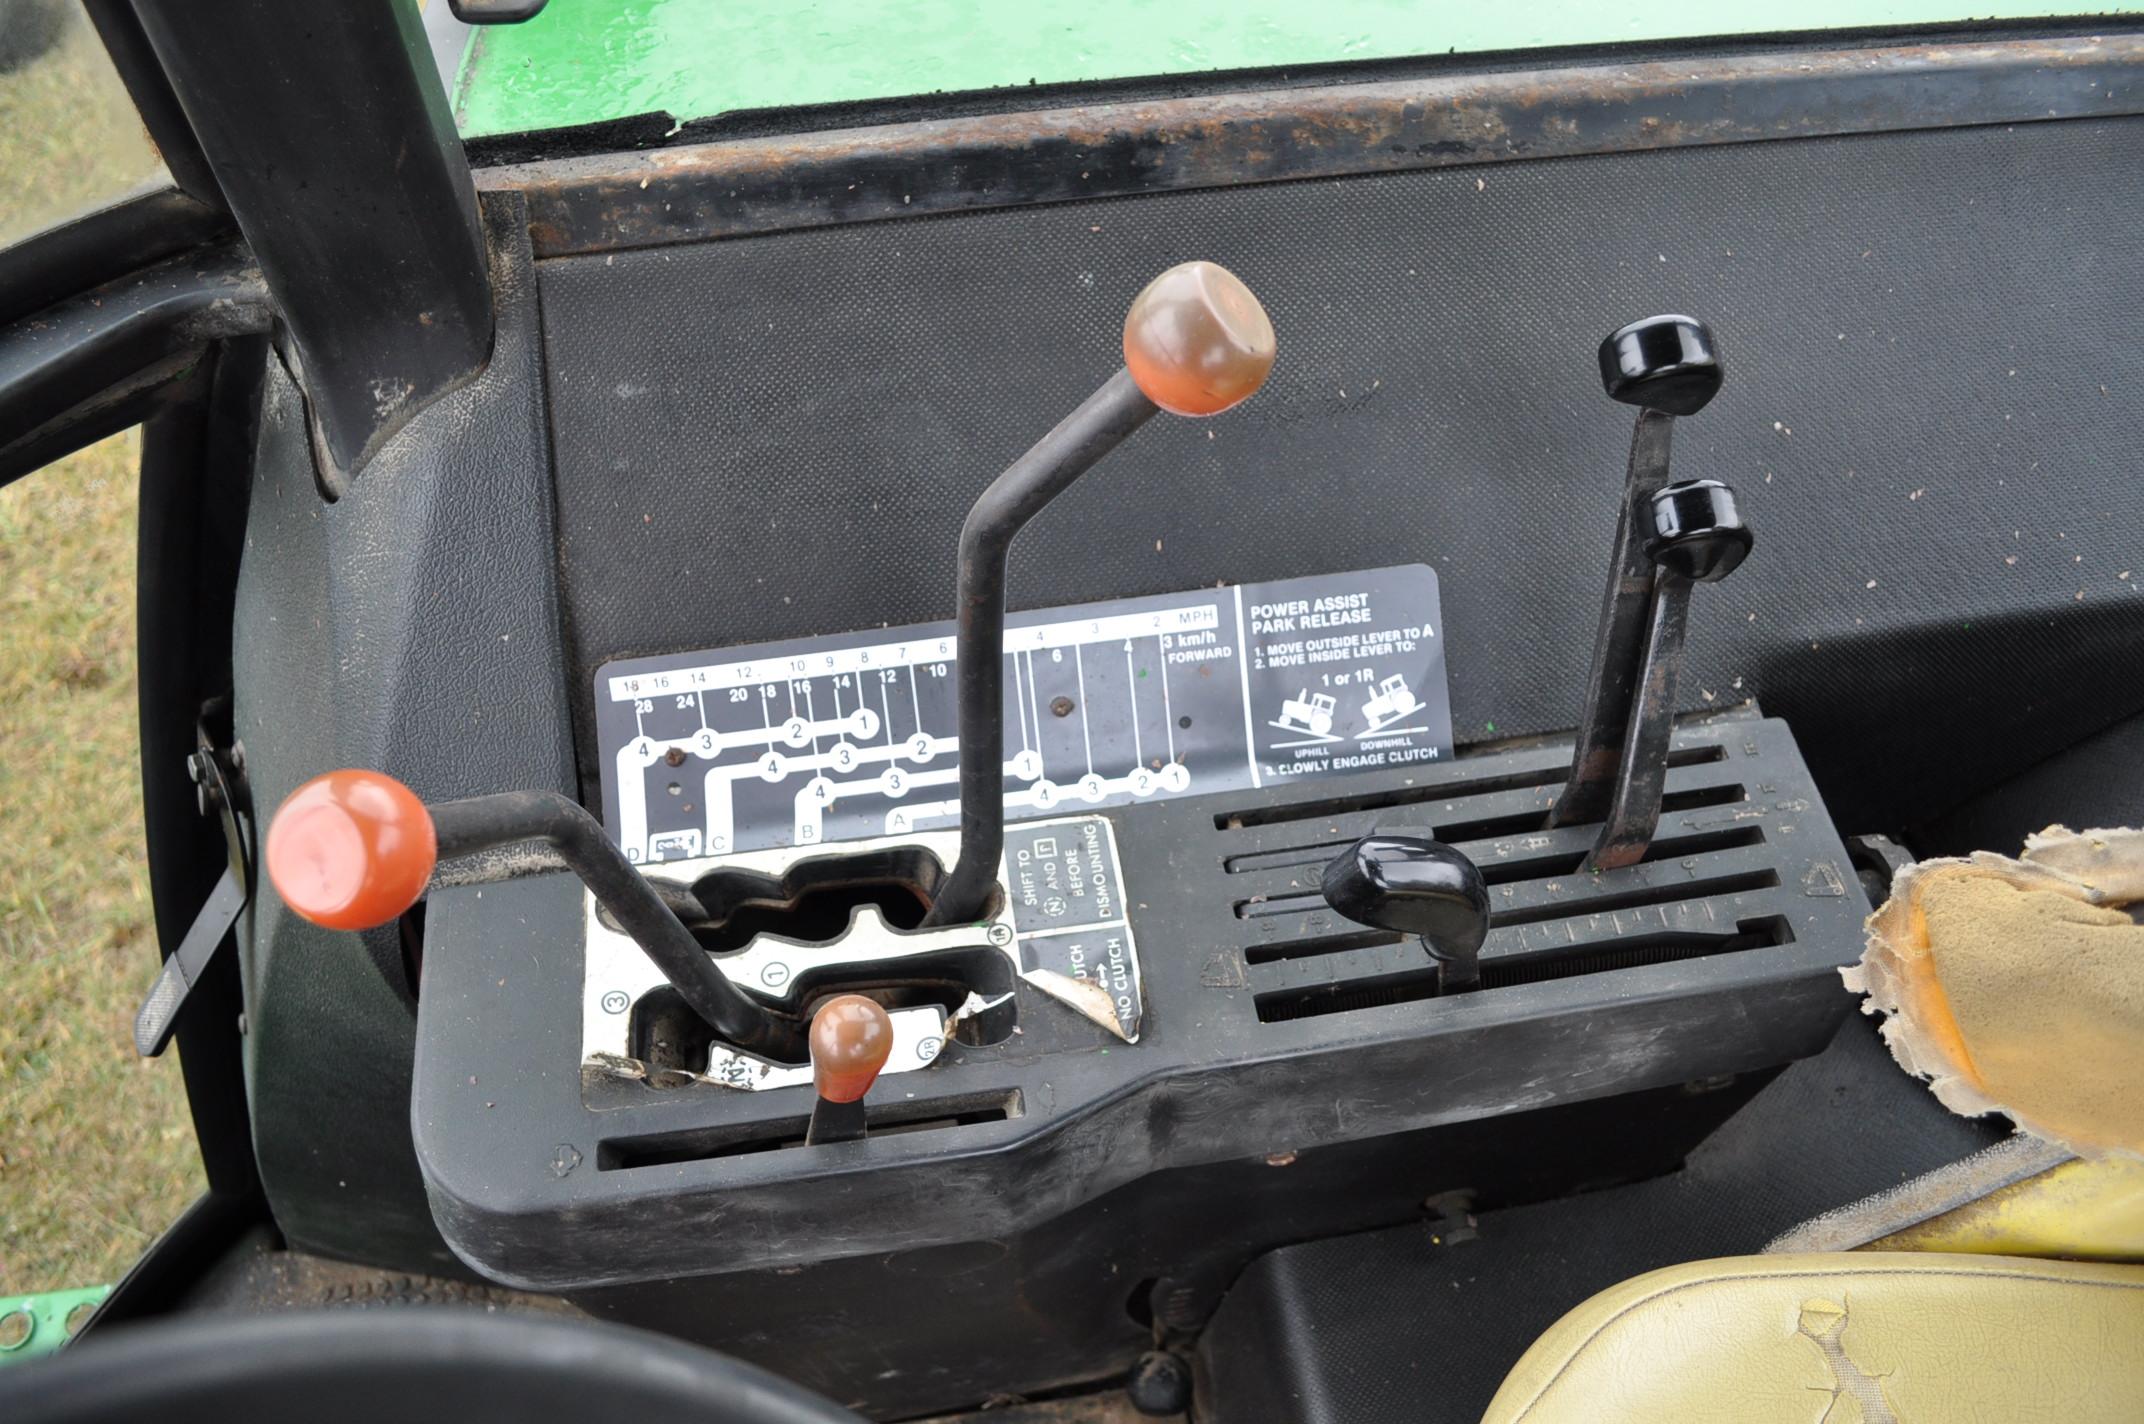 John Deere 4230 tractor, diesel, 18.4-34 hub duals, 10.00-16 front, CHA, Quad range, 2 hyd - Image 20 of 23